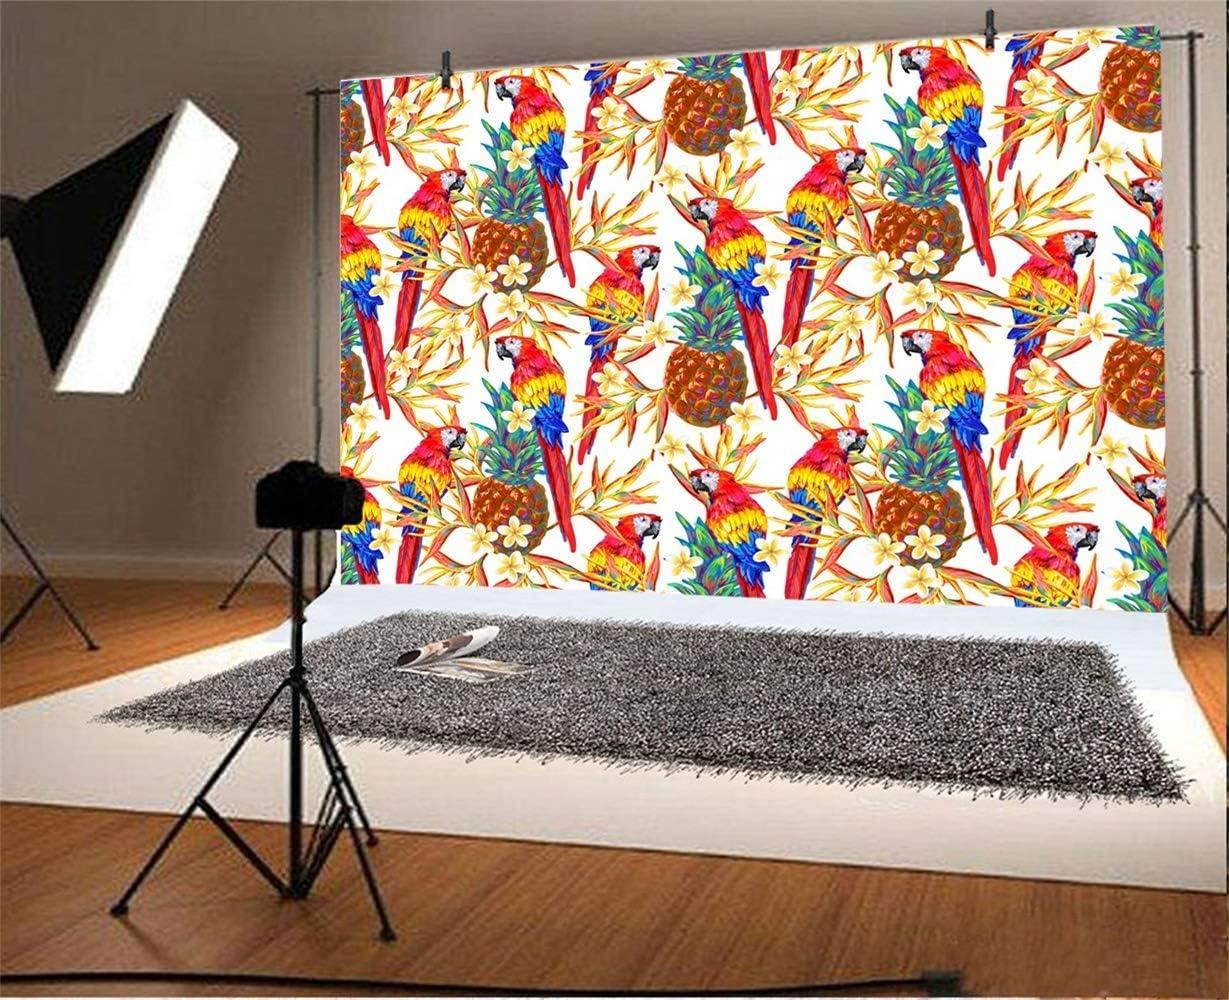 10x7ft Tropical Fruit Pineapples Flowers Parrots Illustration Vinyl Photography Background Child Adult Portrait Shoot Backdrop Summer Party Banner Indoor Decors Wallpaper Studio Props